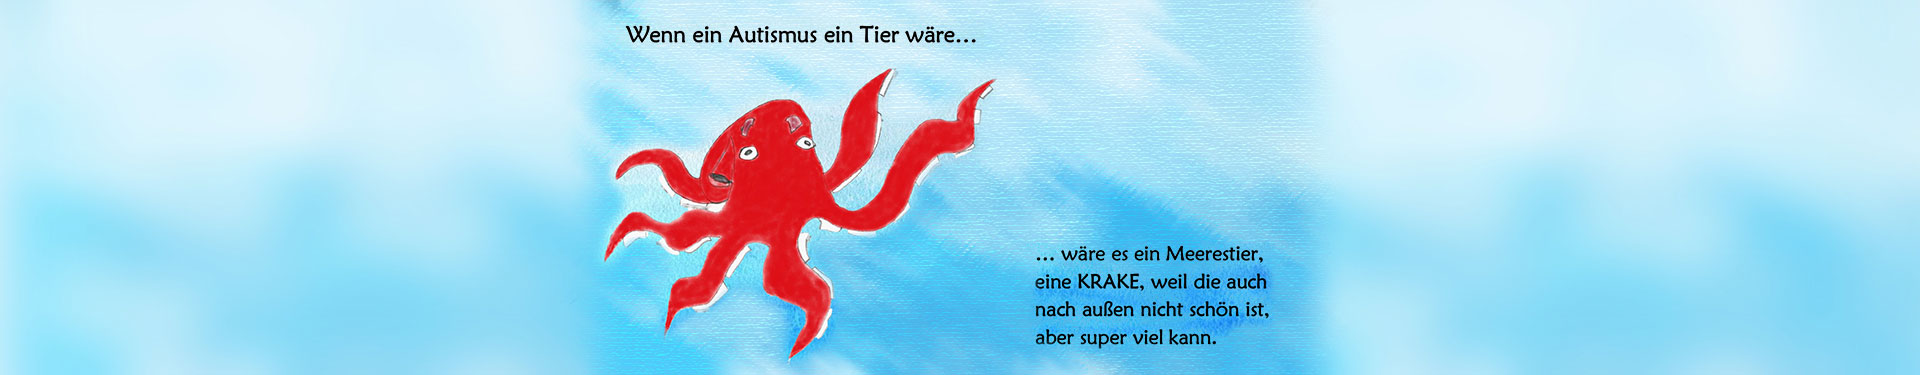 autisamb-halle-krake-banner